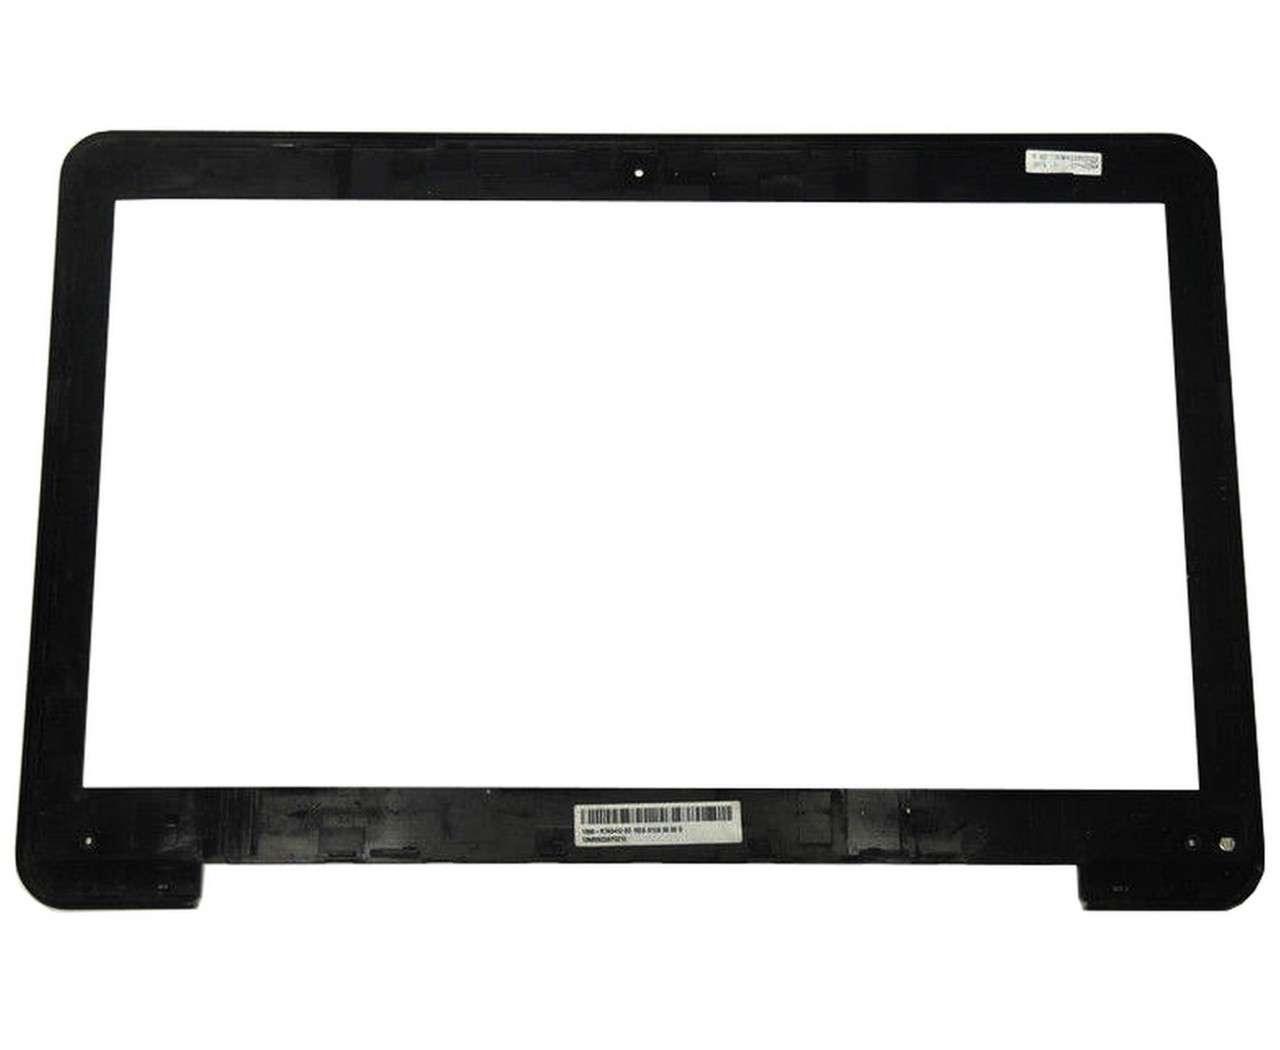 Rama Display Asus X555LB Bezel Front Cover Neagra imagine powerlaptop.ro 2021